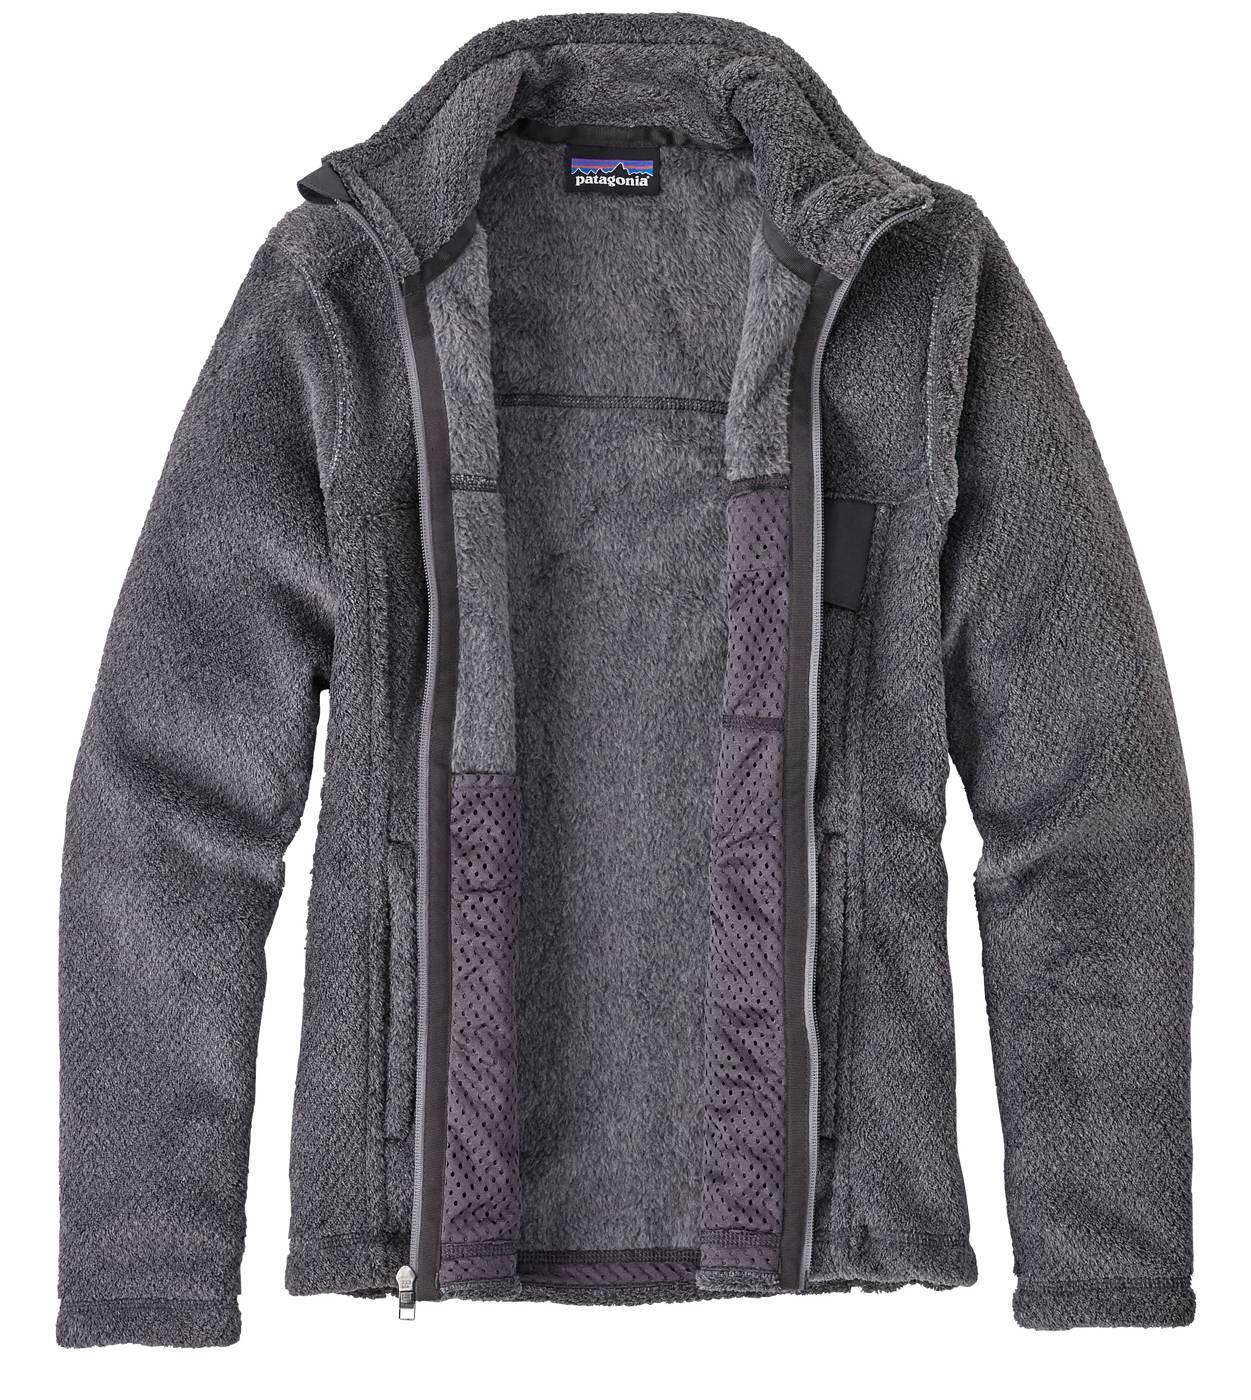 Patagonia Custom Womens FullZip ReTool Fleece Jacket